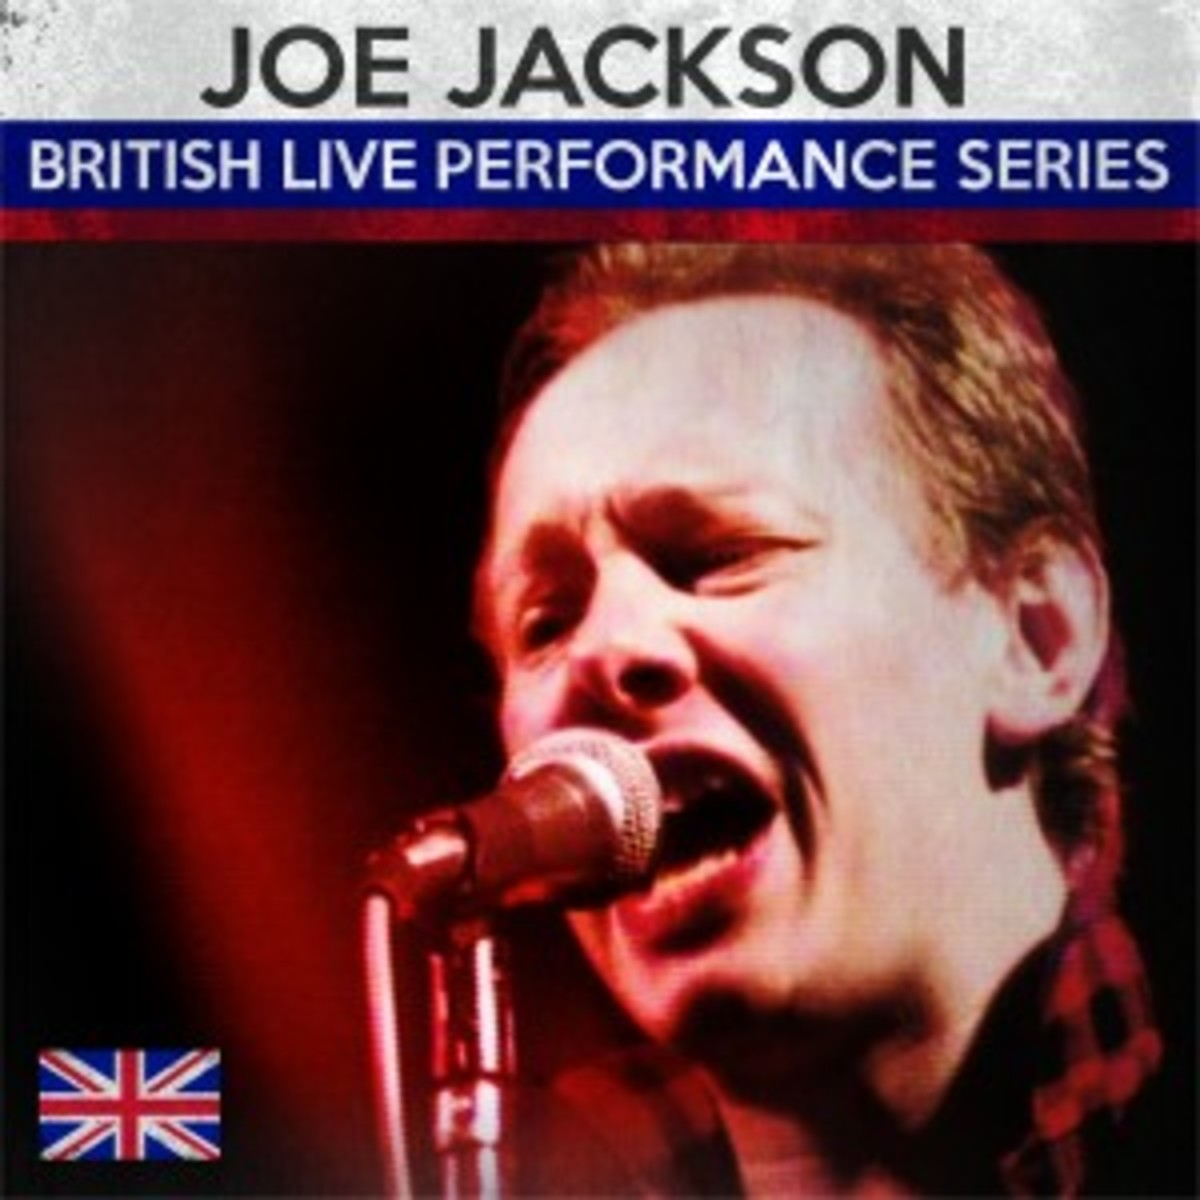 Joe Jackson -- British Live Performance Series CD cover